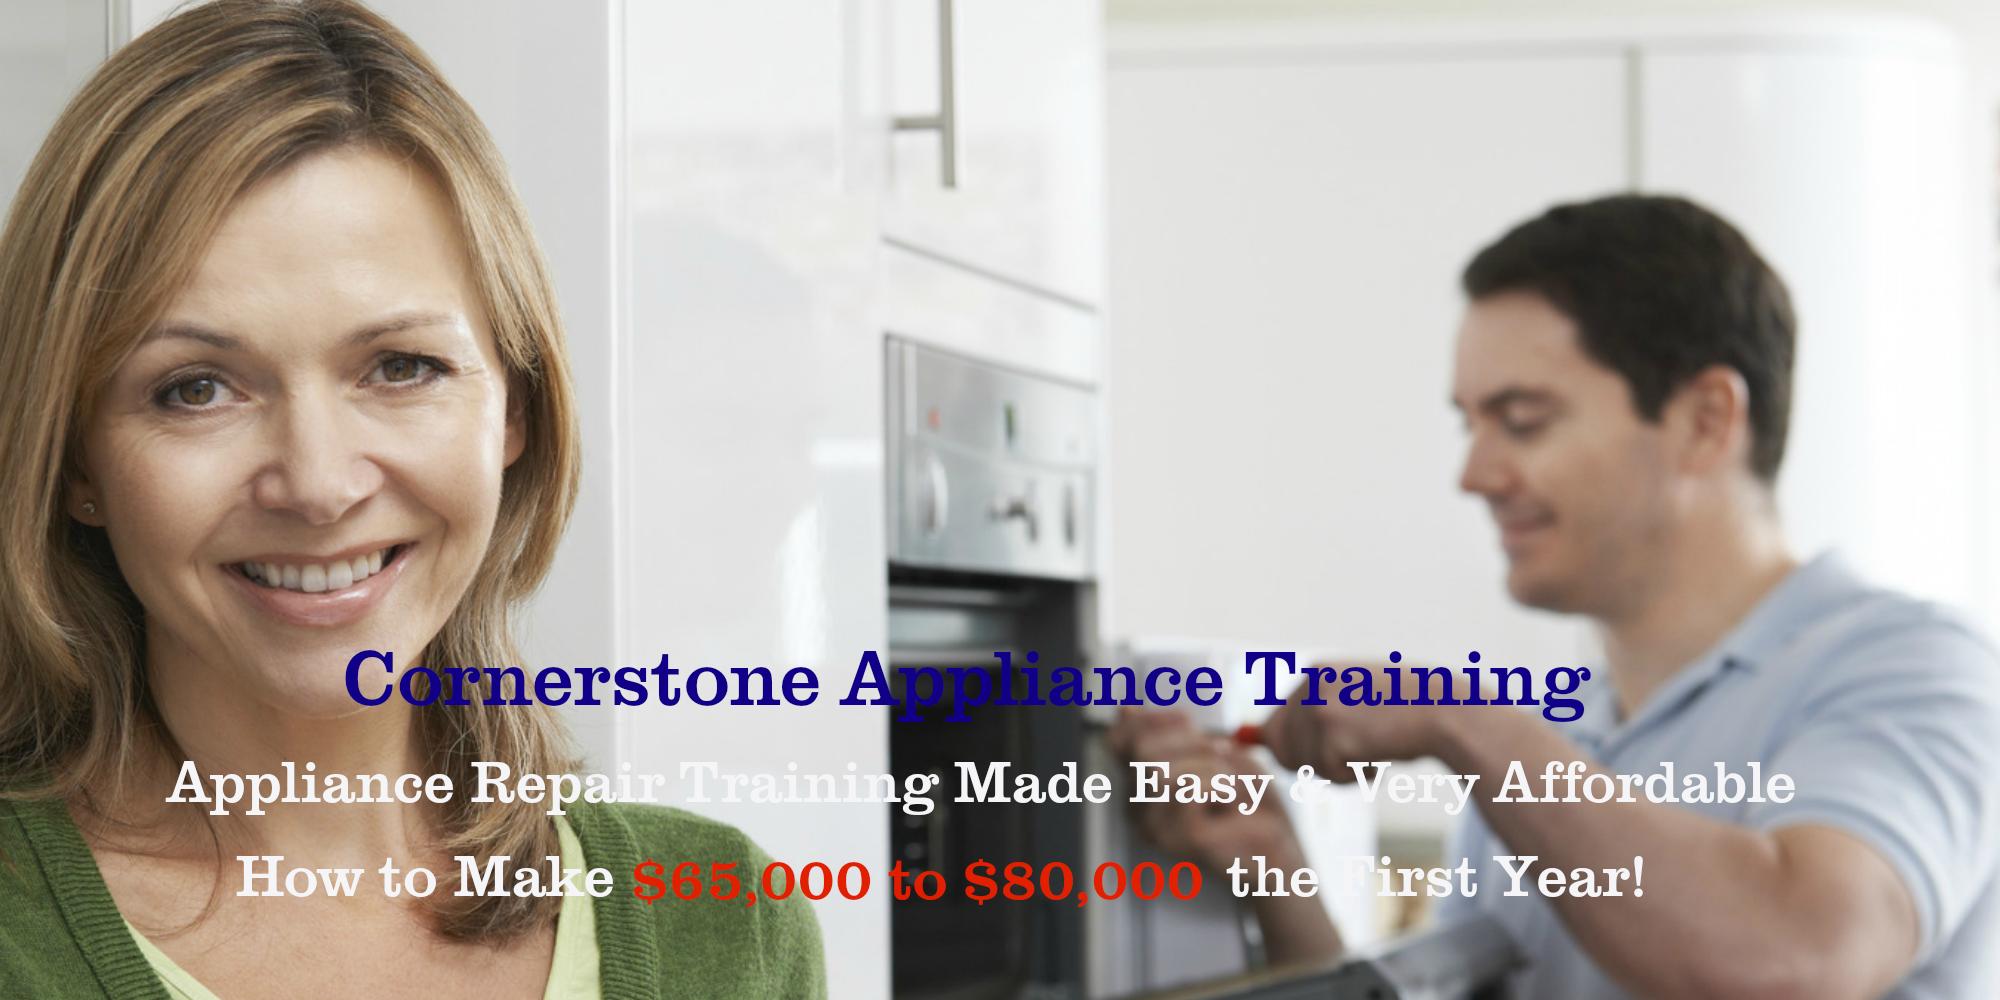 Online Appliance Repair Training Change 2